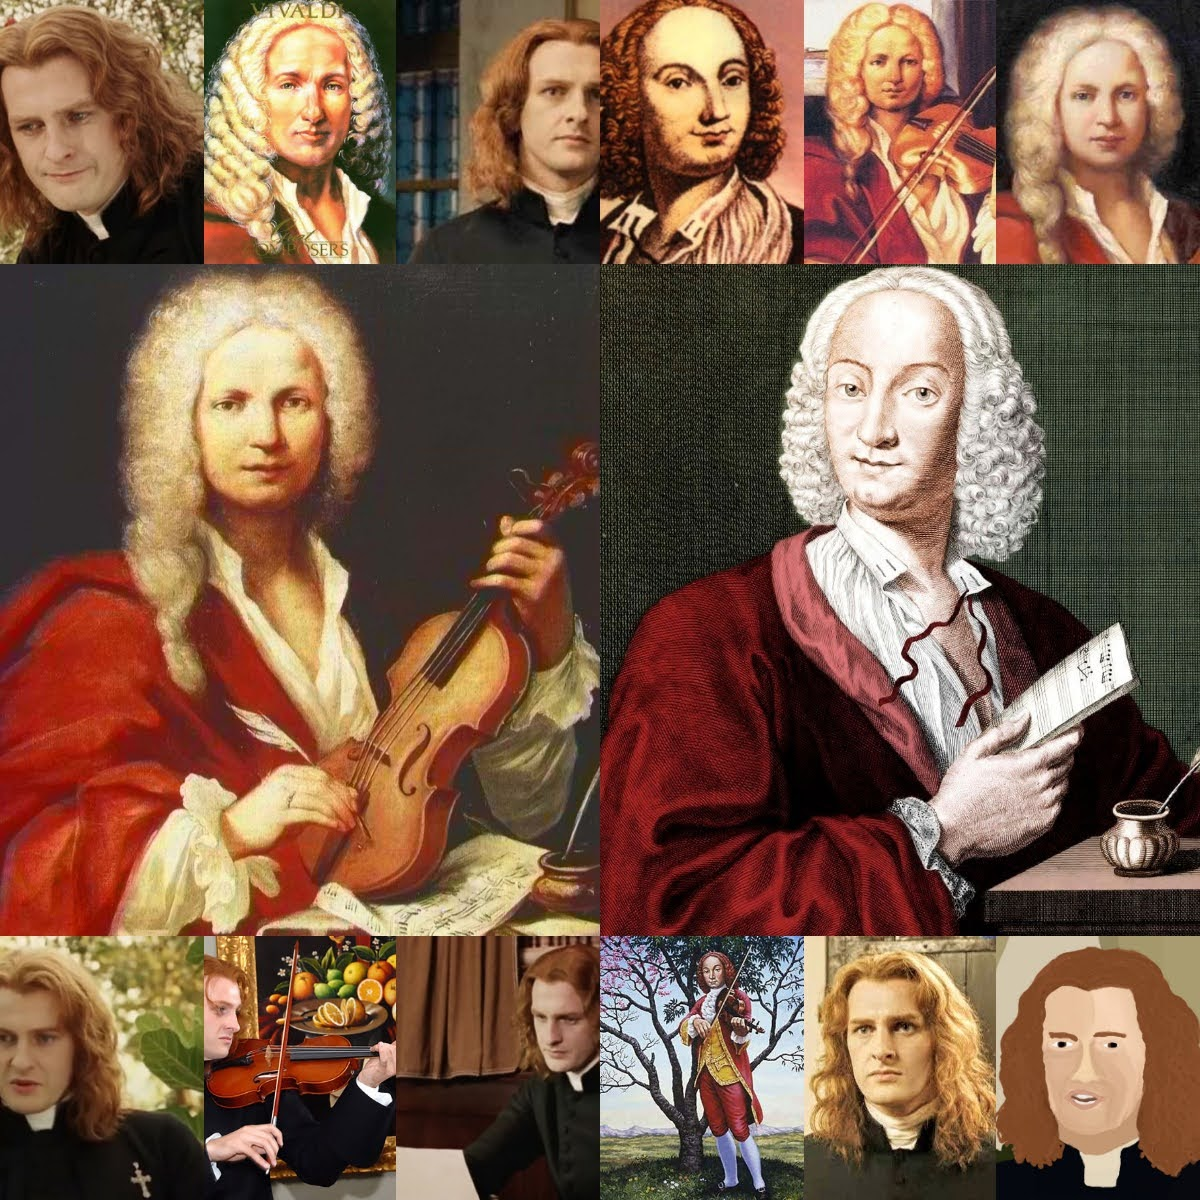 Vivaldi Red Priest